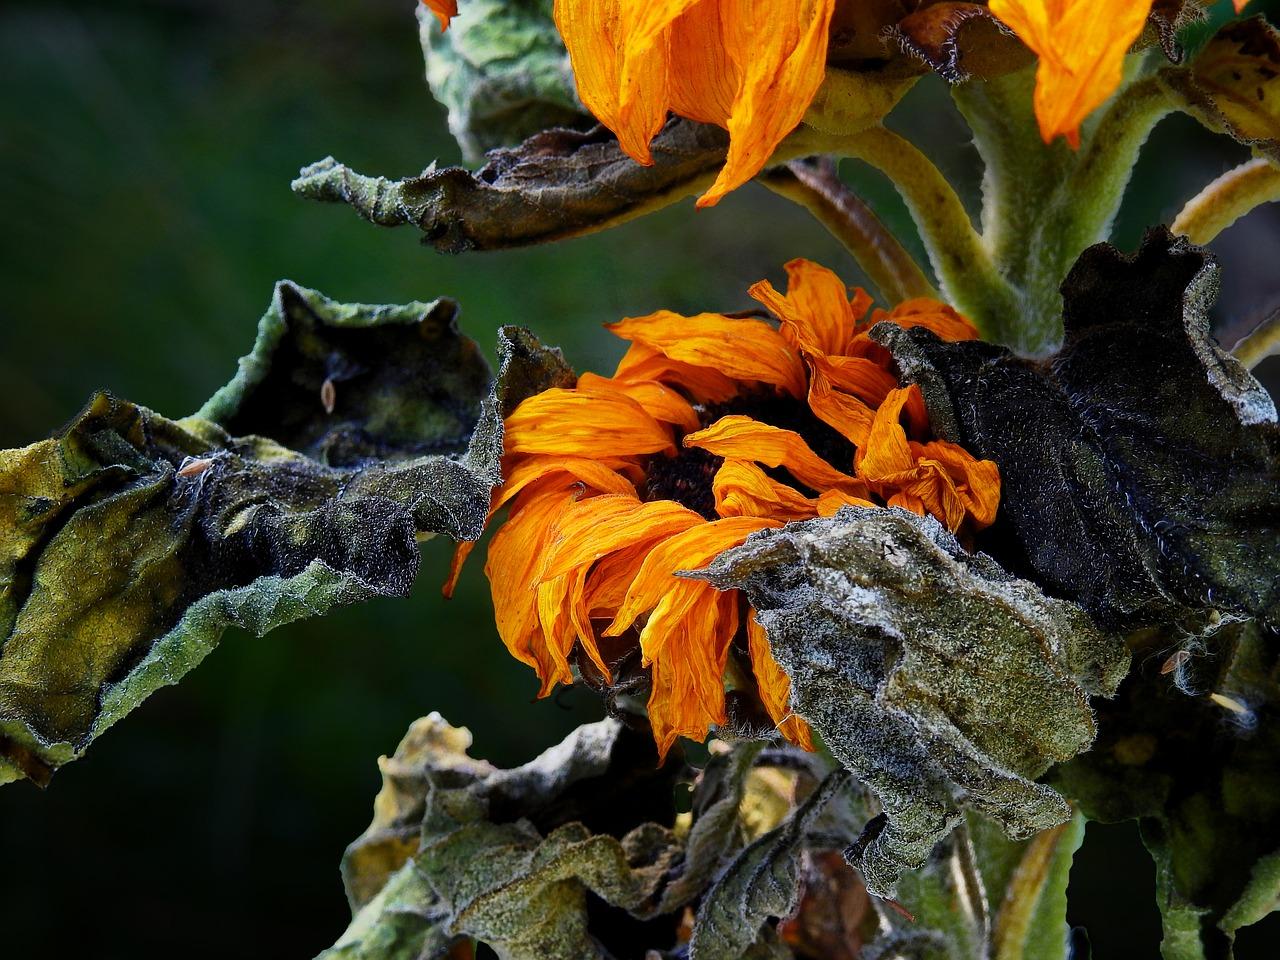 sun-flower-1592910_1280